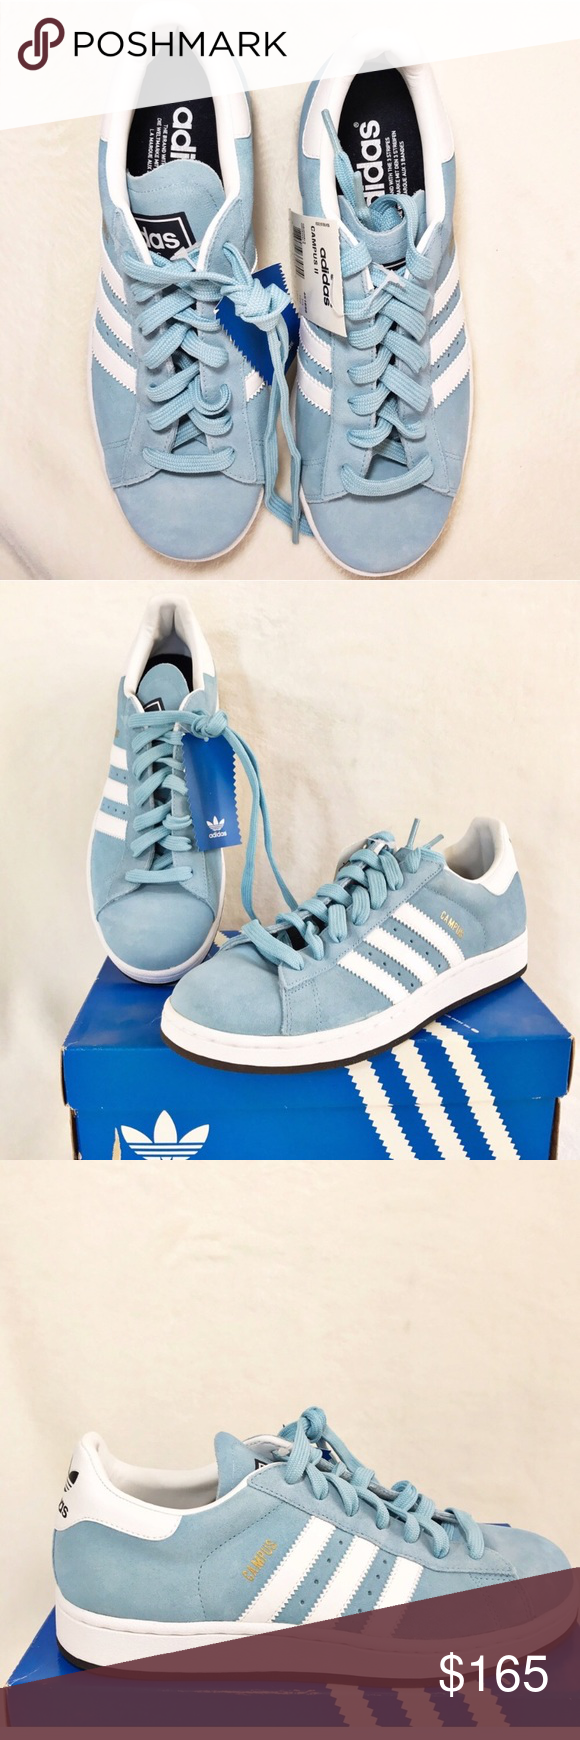 Adidas campus ii azzurre, campus 451696 nwt la posh sceglie